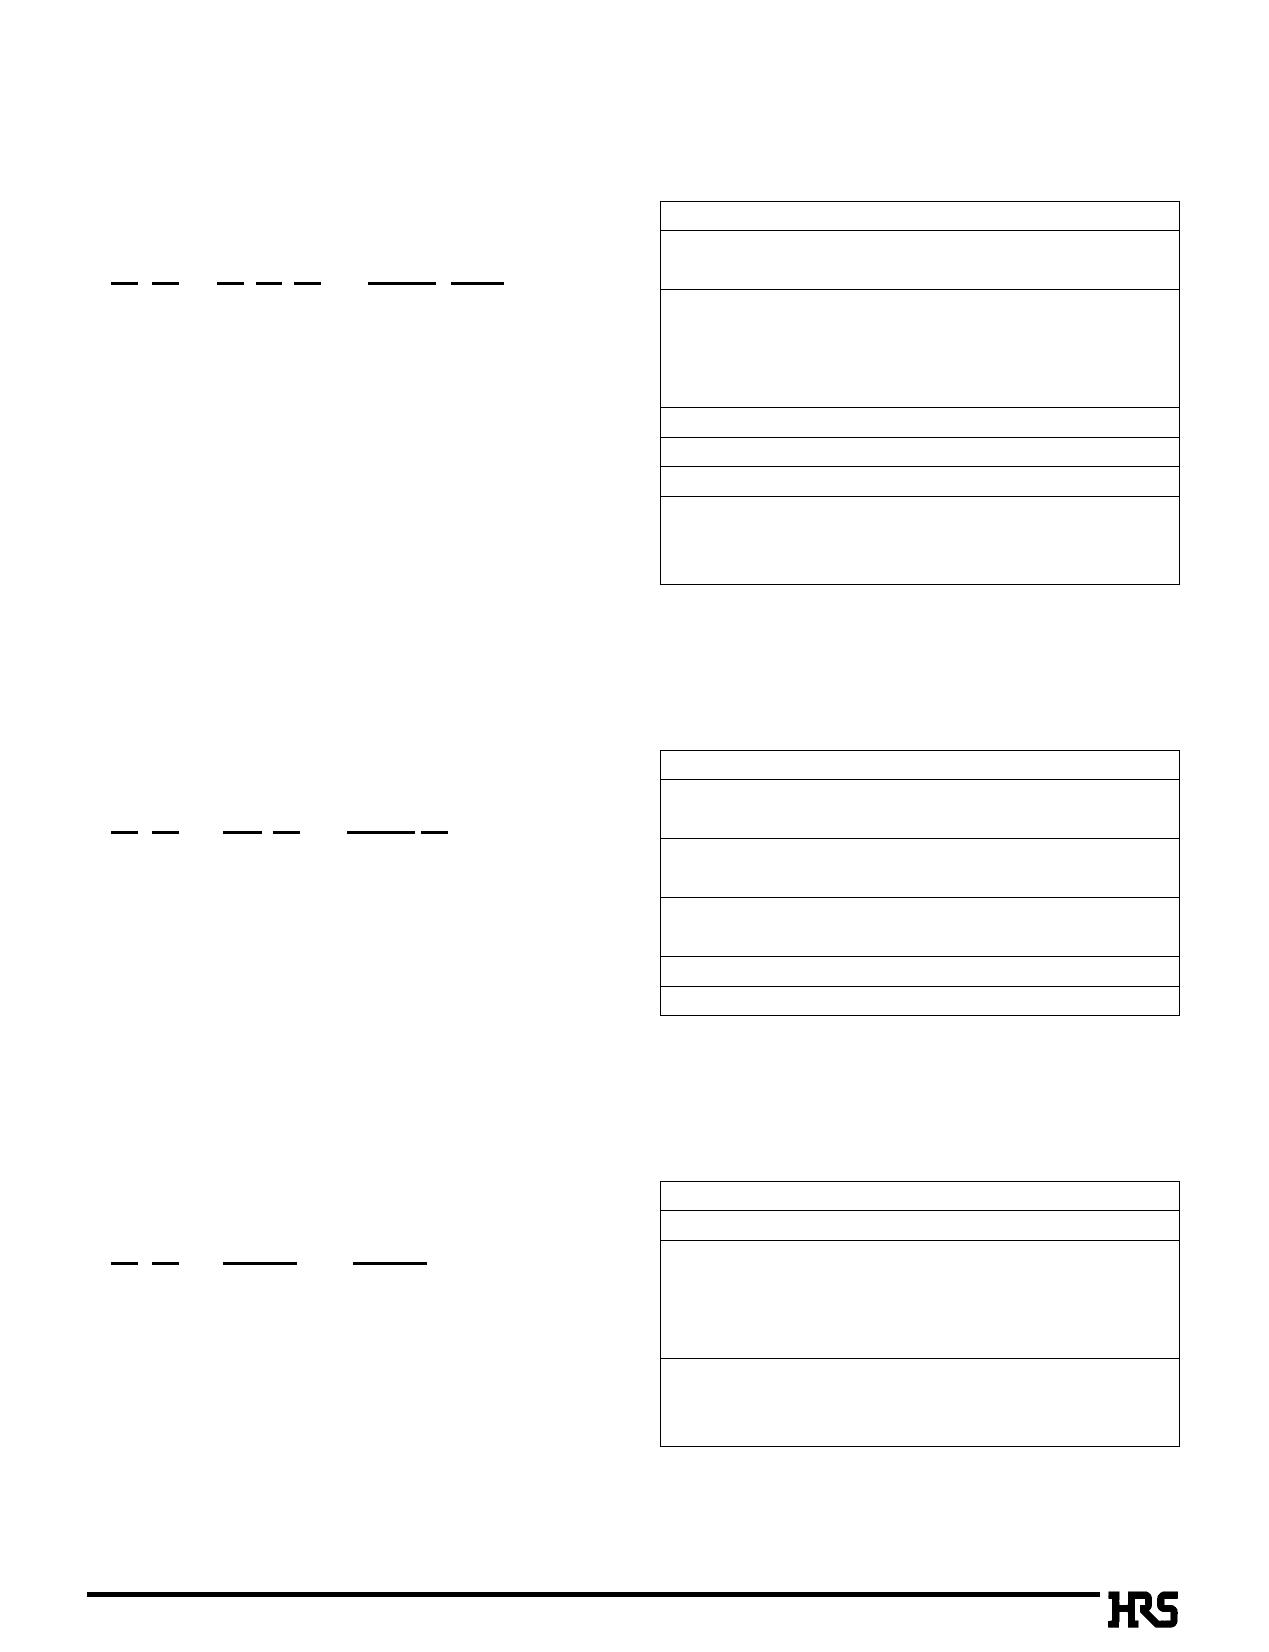 A1-64PA-2.54DS pdf, schematic